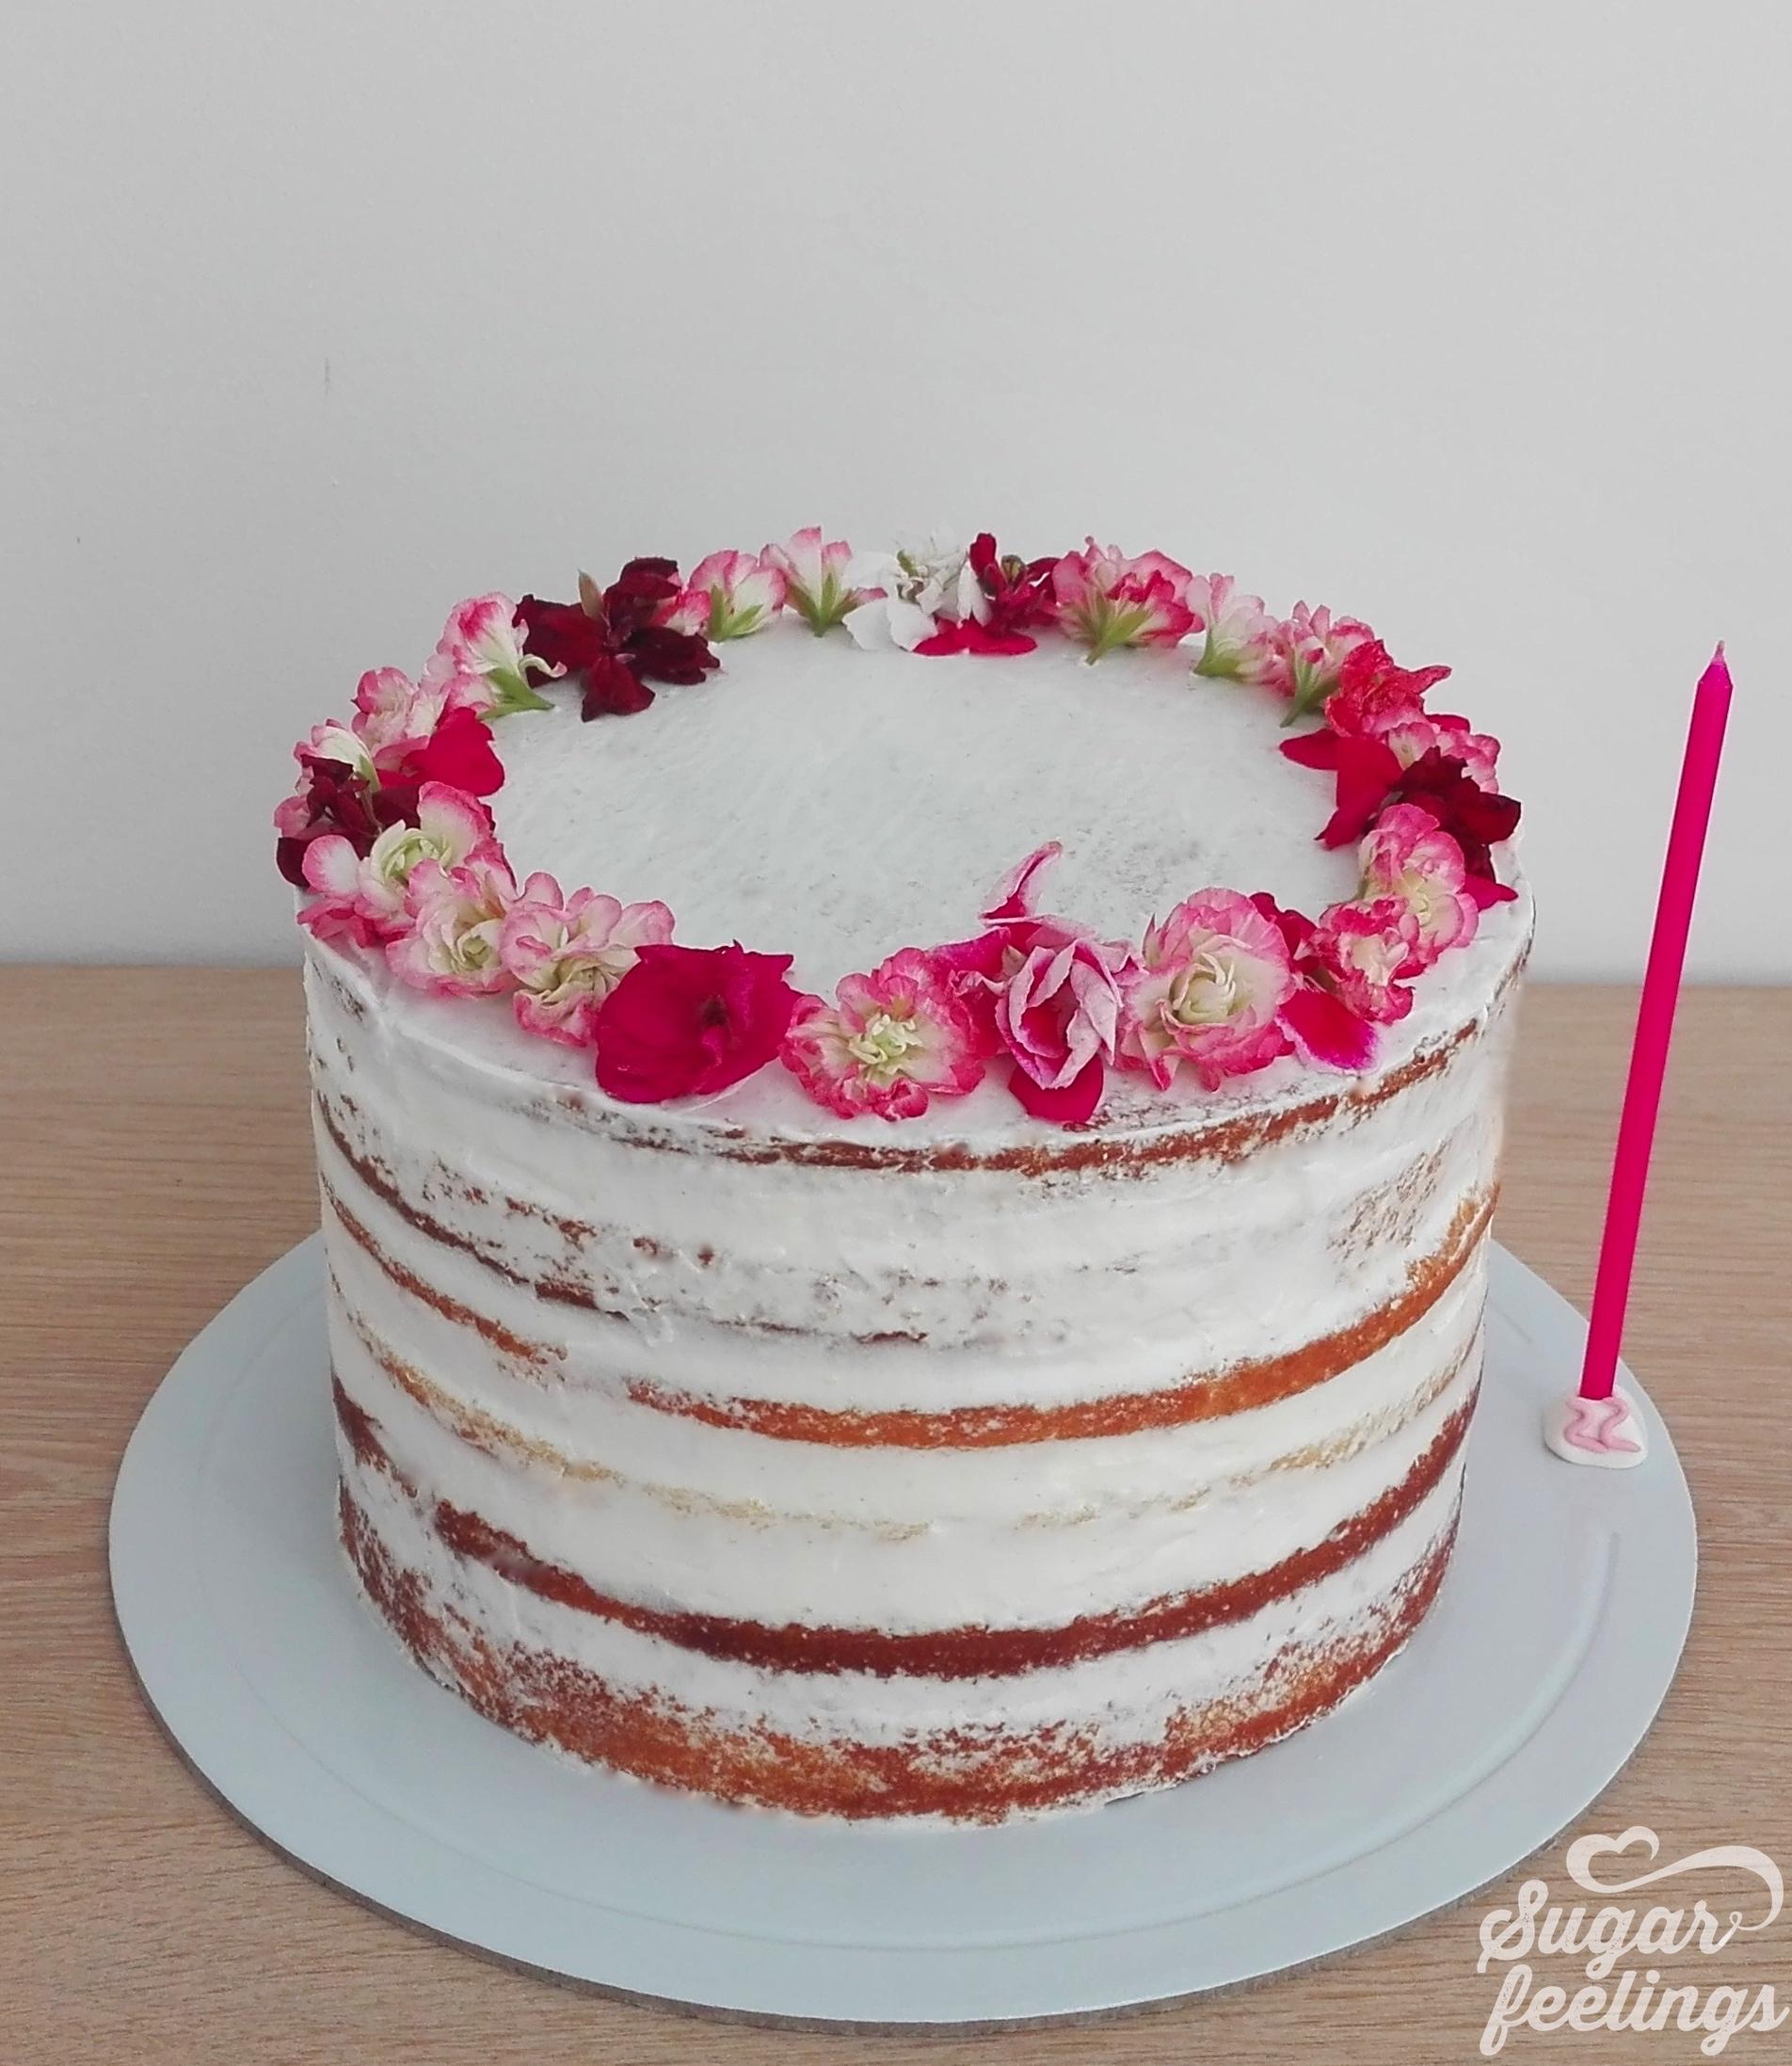 Naked Cake & Edible flowers